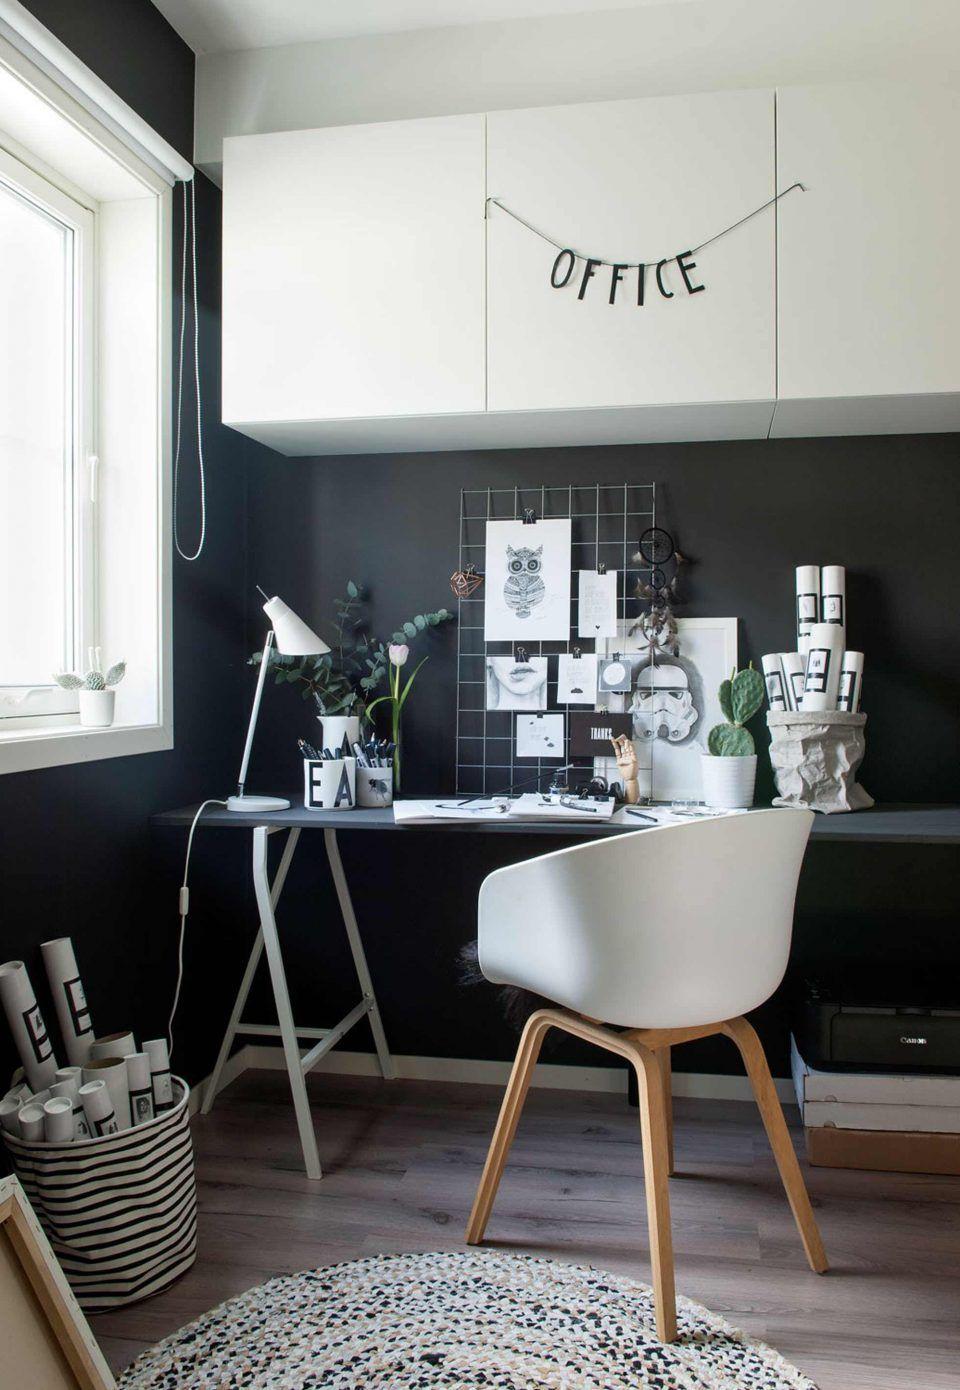 Da hjemmet vårt ble kåret til «Norges vakreste hjem 2016»! – Maren Baxter